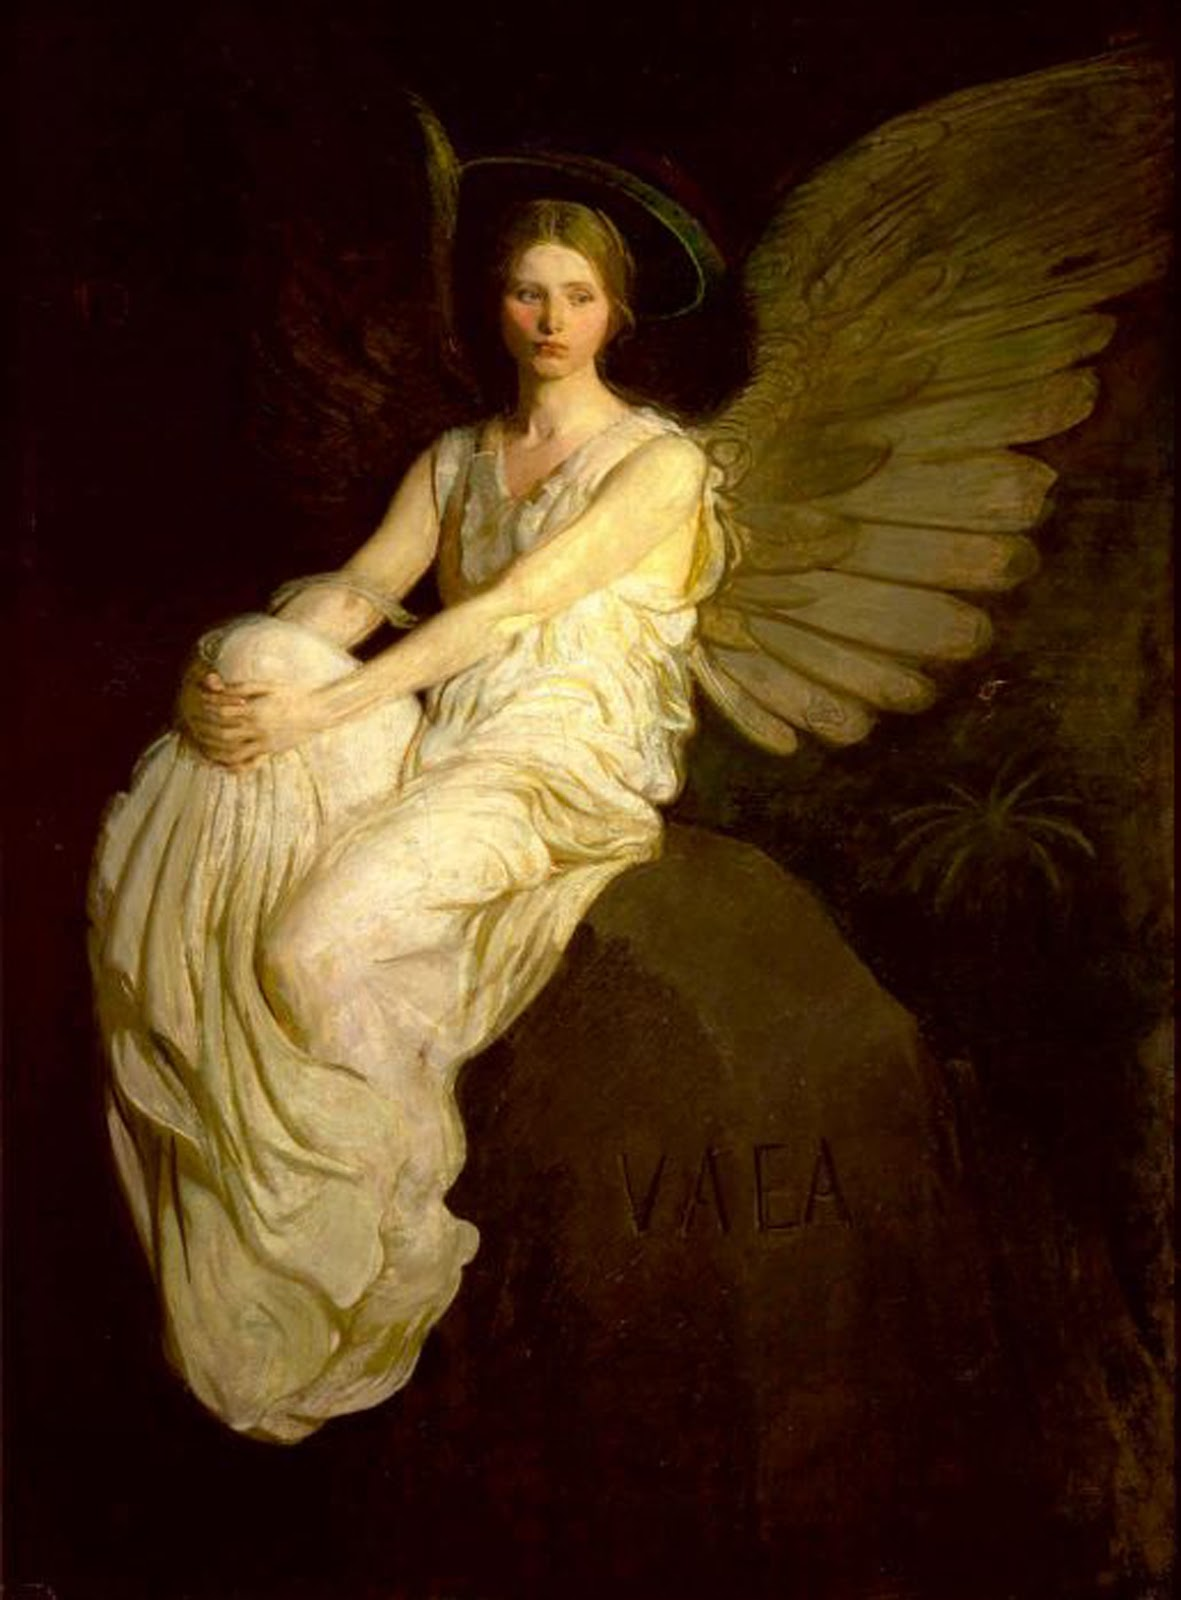 angel painting renaissance - photo #6